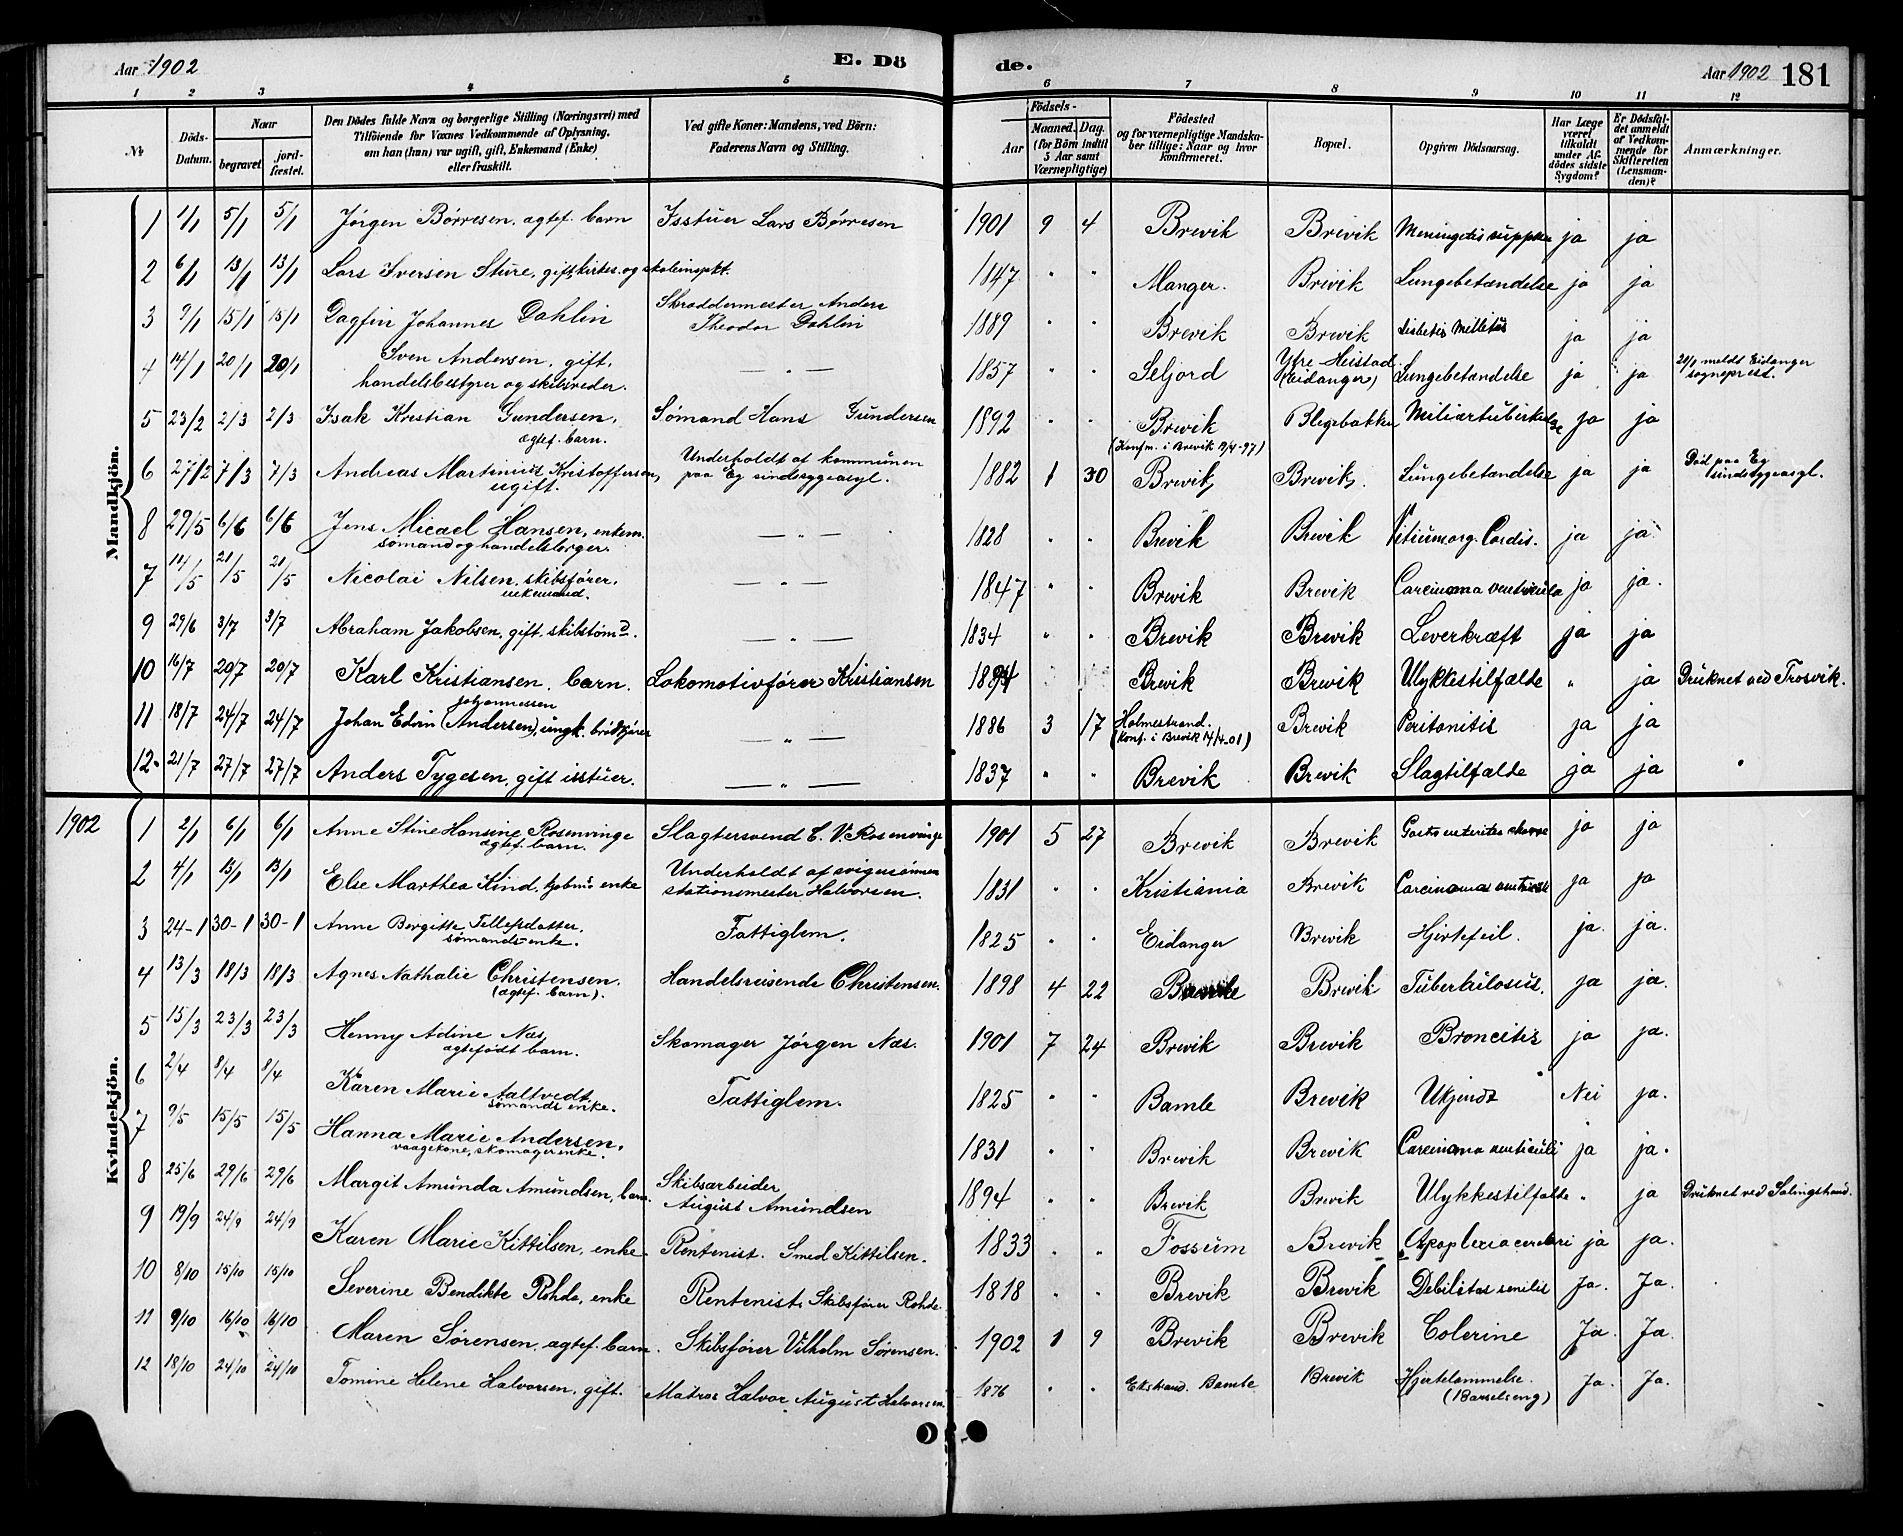 SAKO, Brevik kirkebøker, G/Ga/L0005: Klokkerbok nr. 5, 1901-1924, s. 181